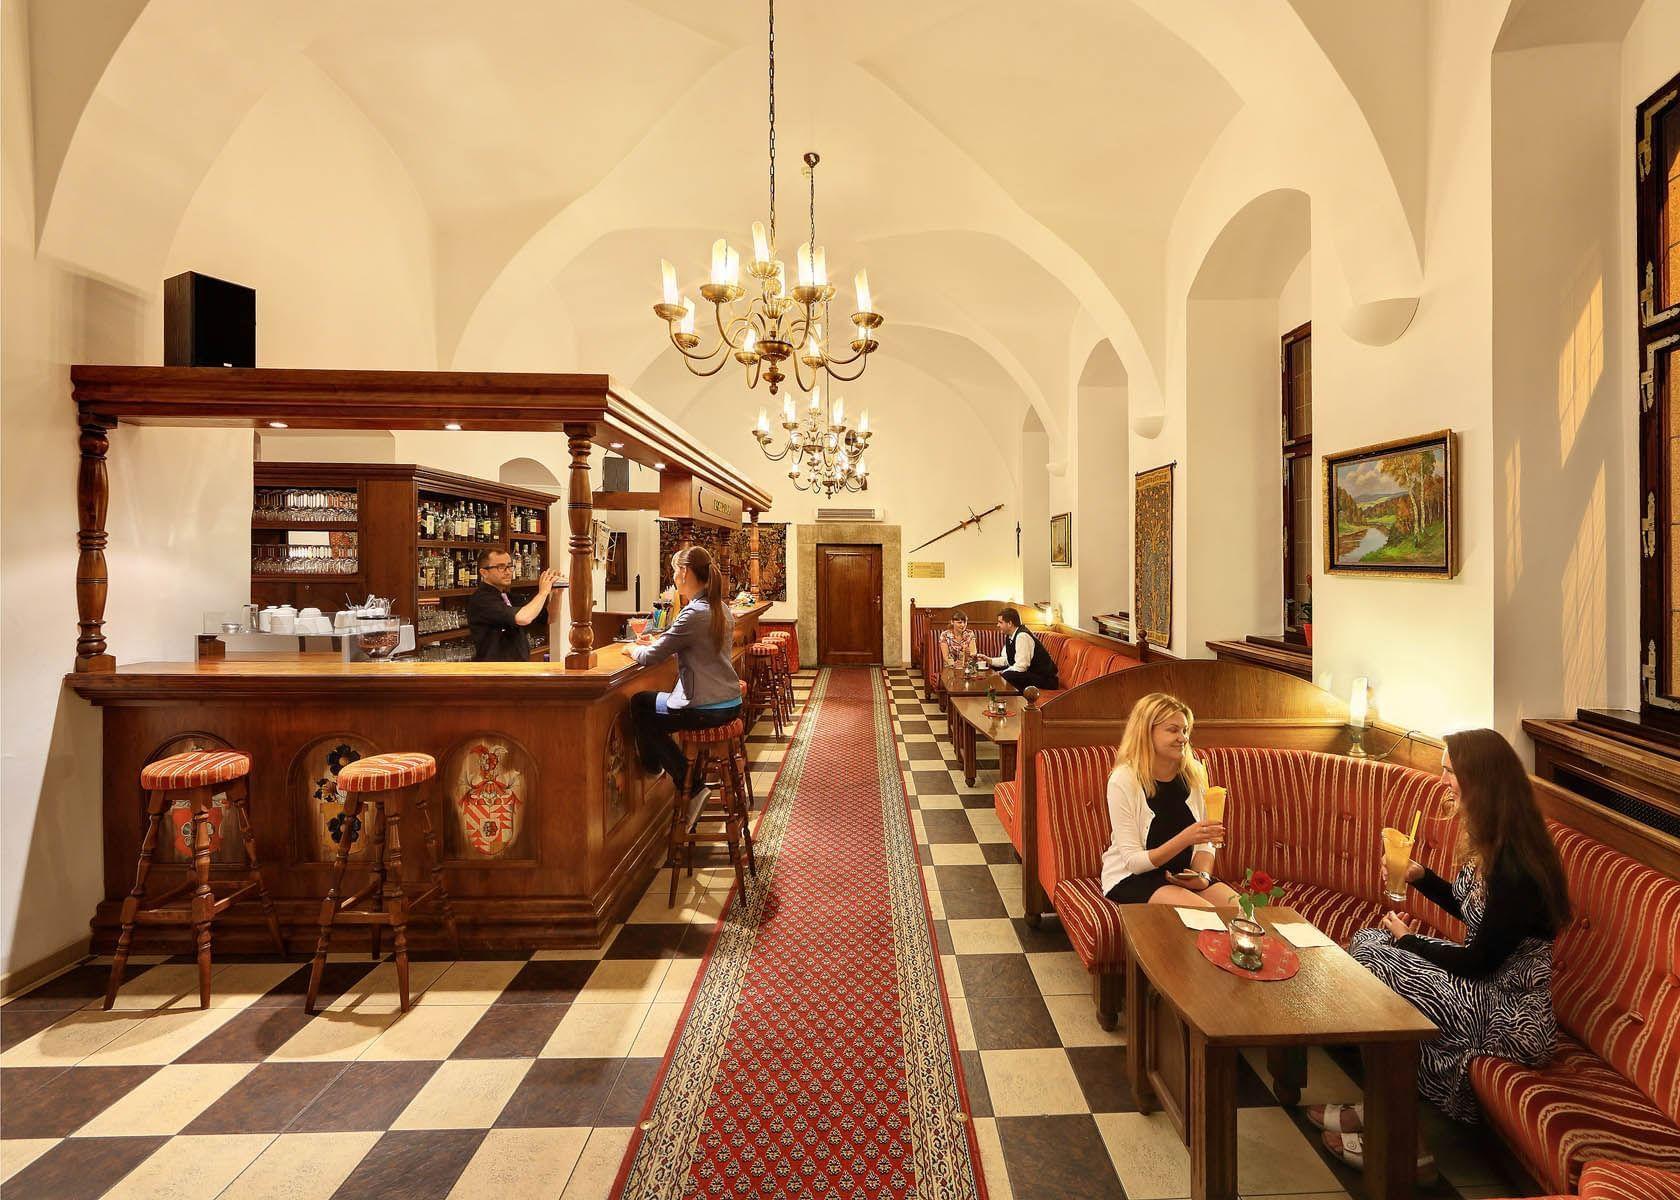 Lobby Bar Hotel Ruze, Český Krumlov, Czech Republic